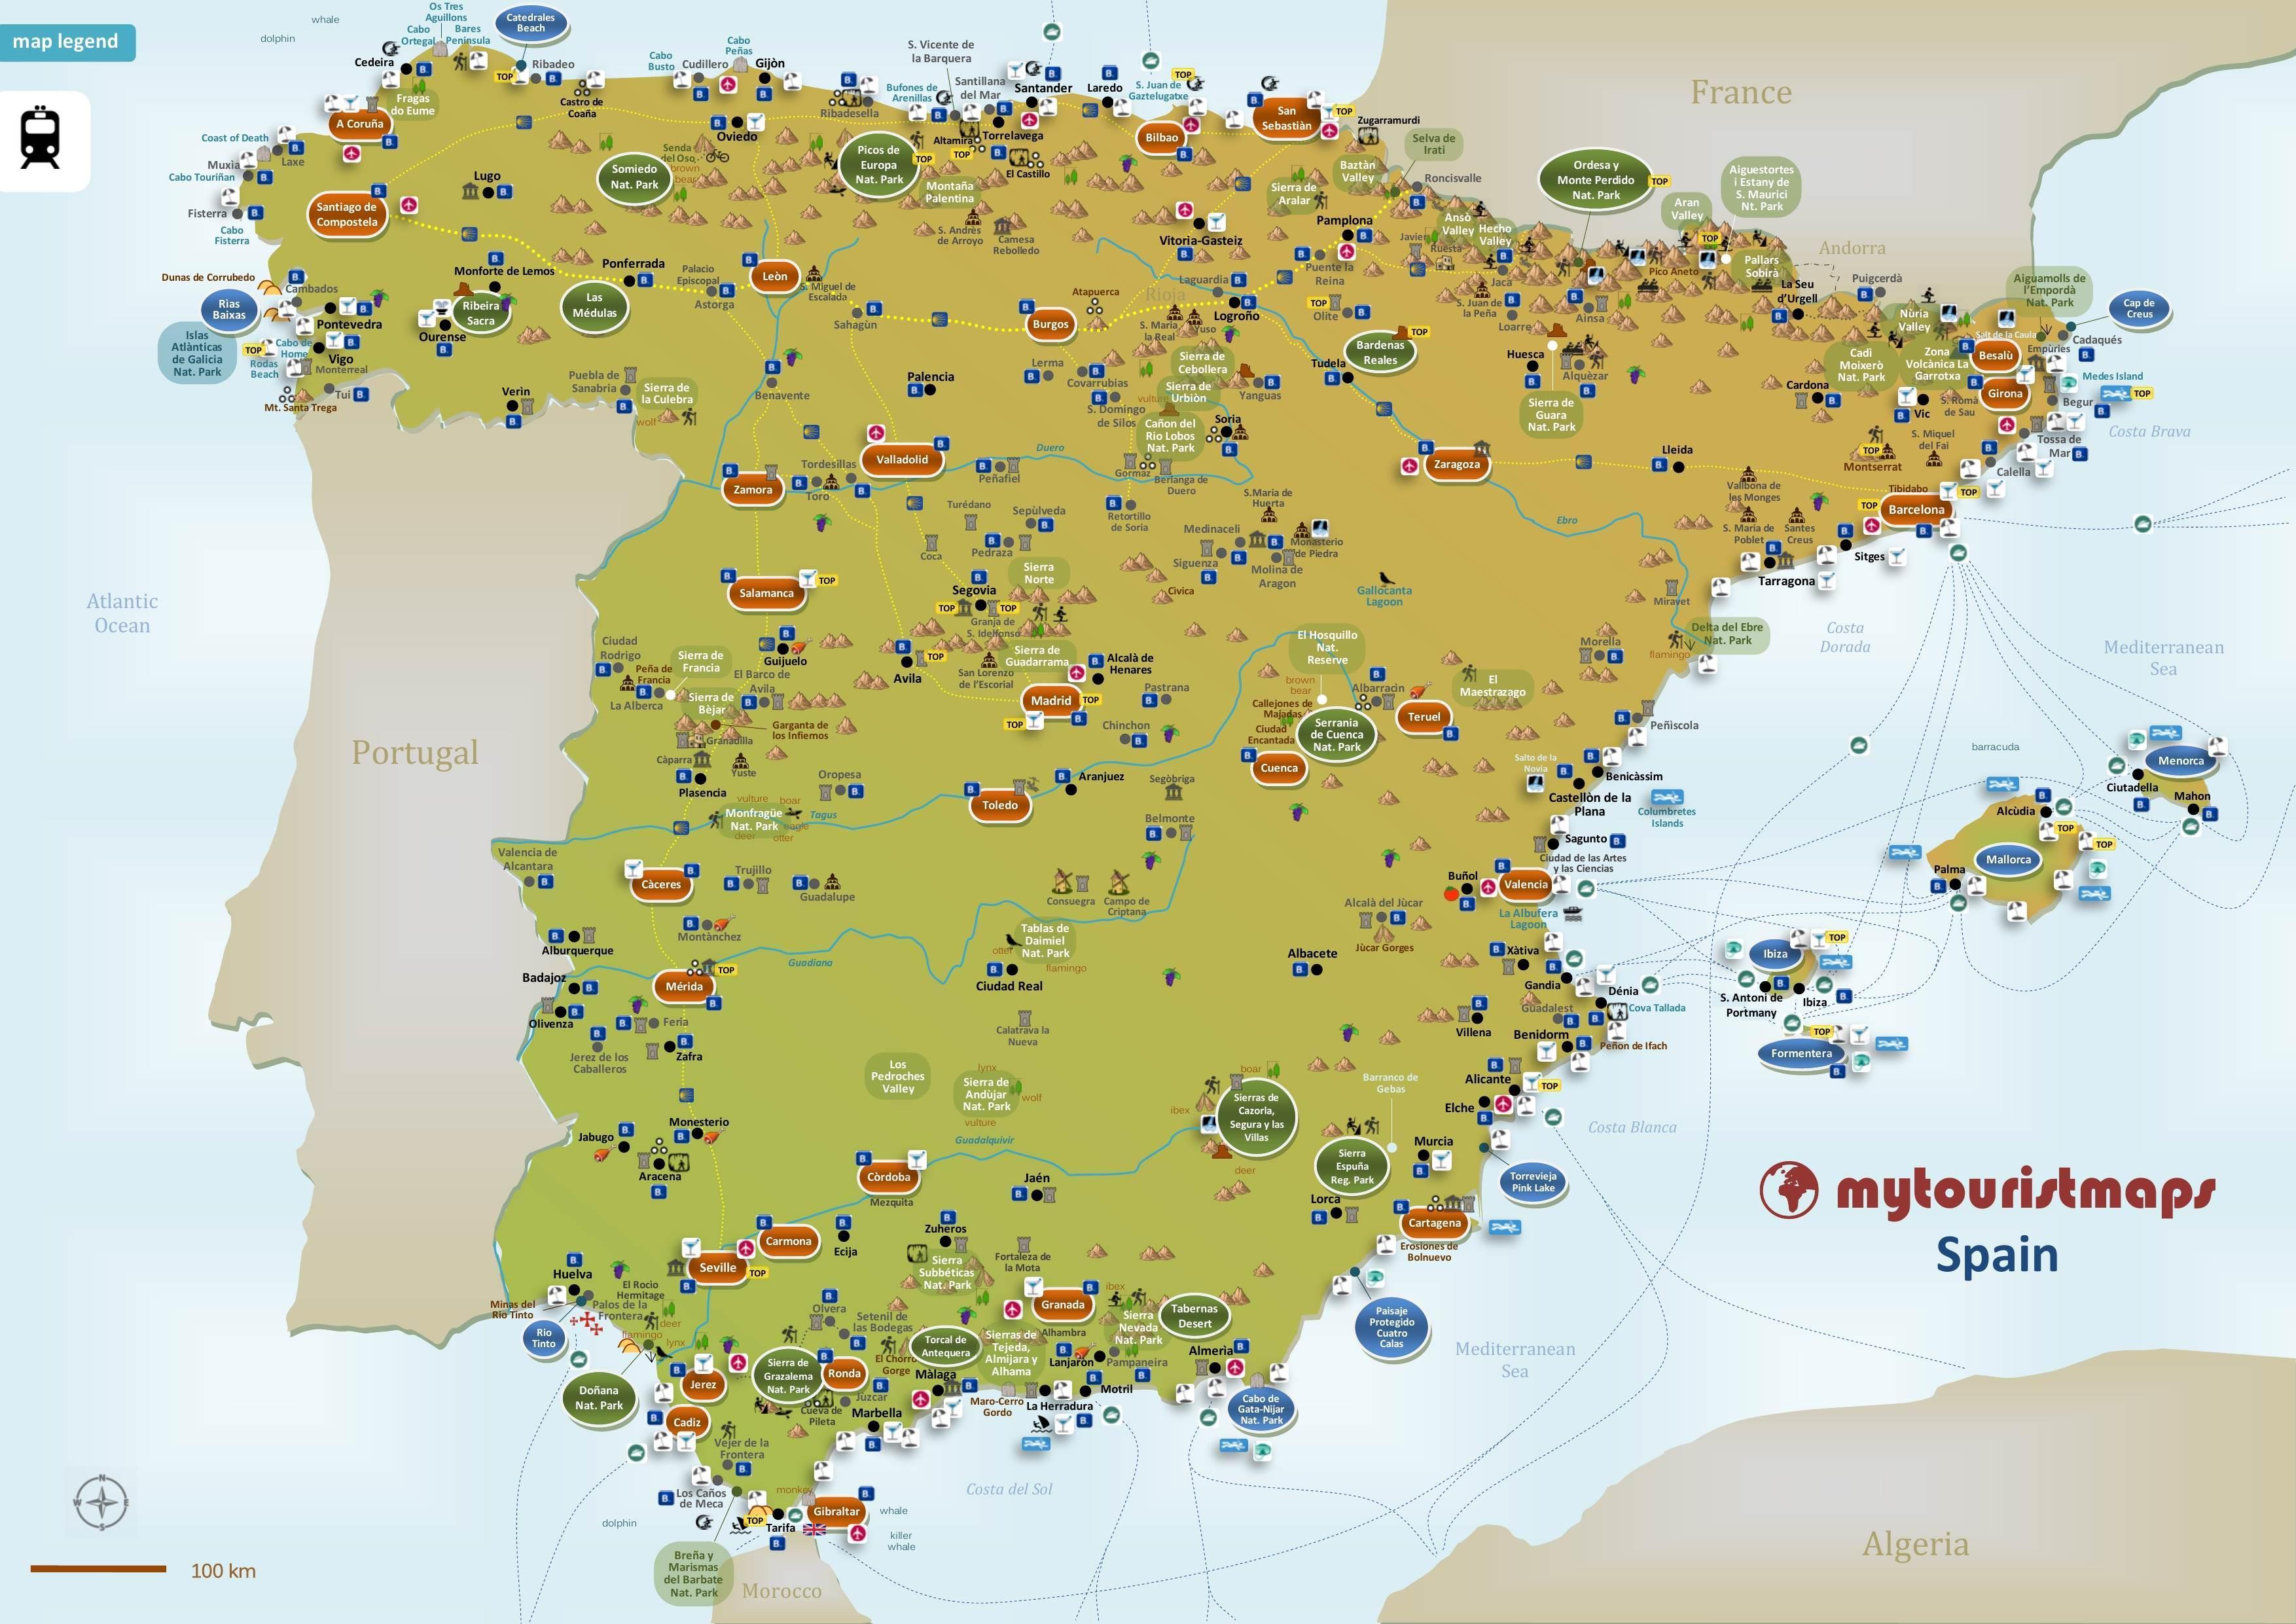 Espagne carte touristique   la Carte de tourisme d'Espagne (Europe